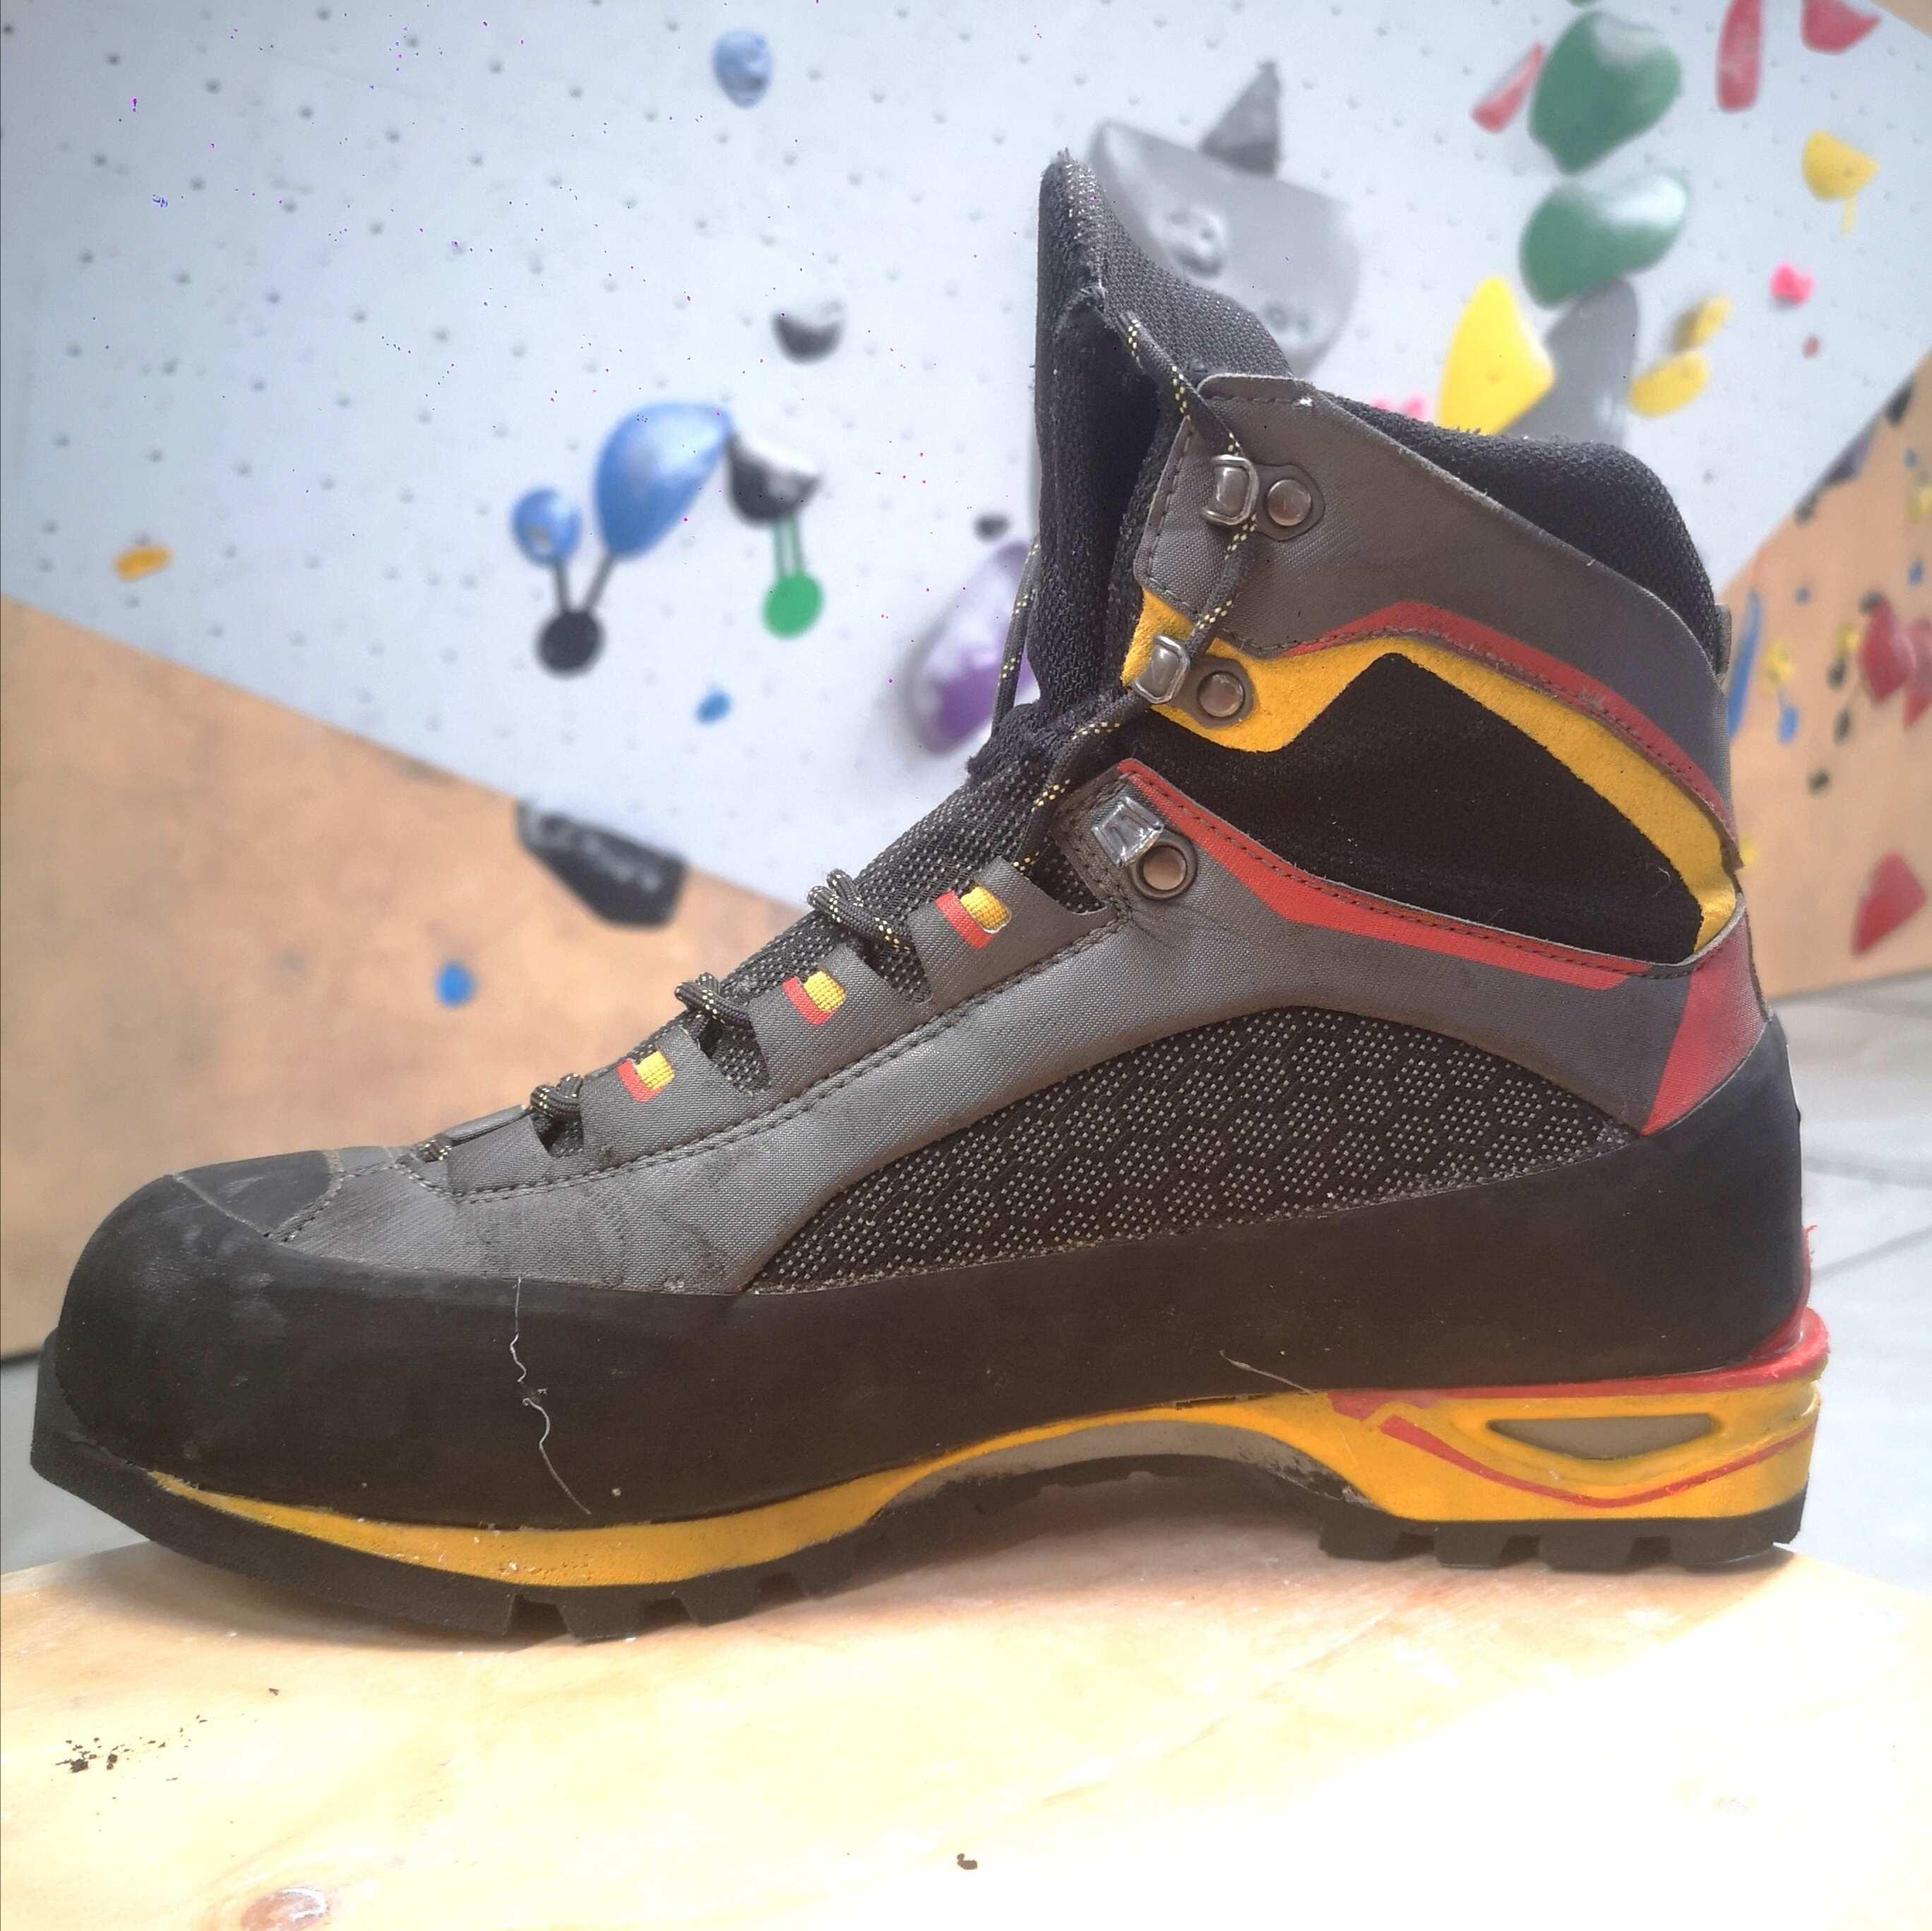 Chaussures d'alpinisme - Semelle